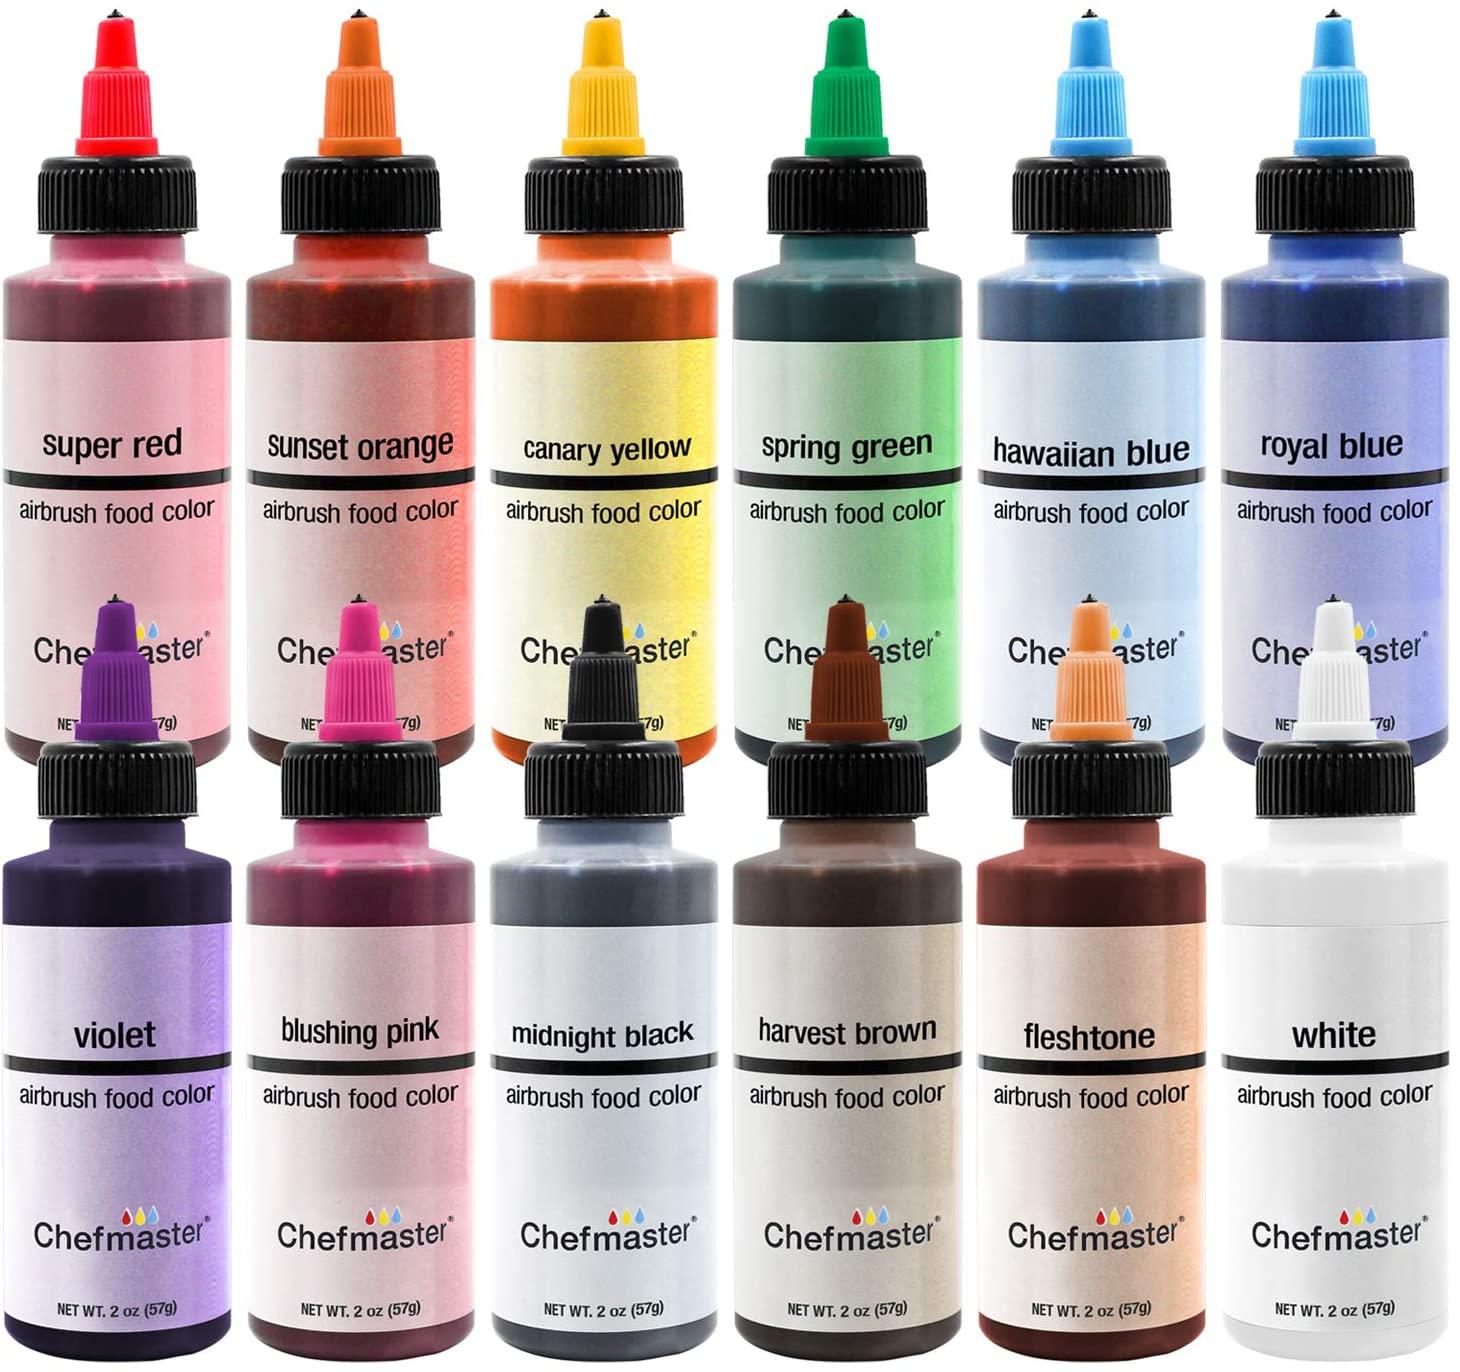 Chefmaster Air Brush Food Coloring review